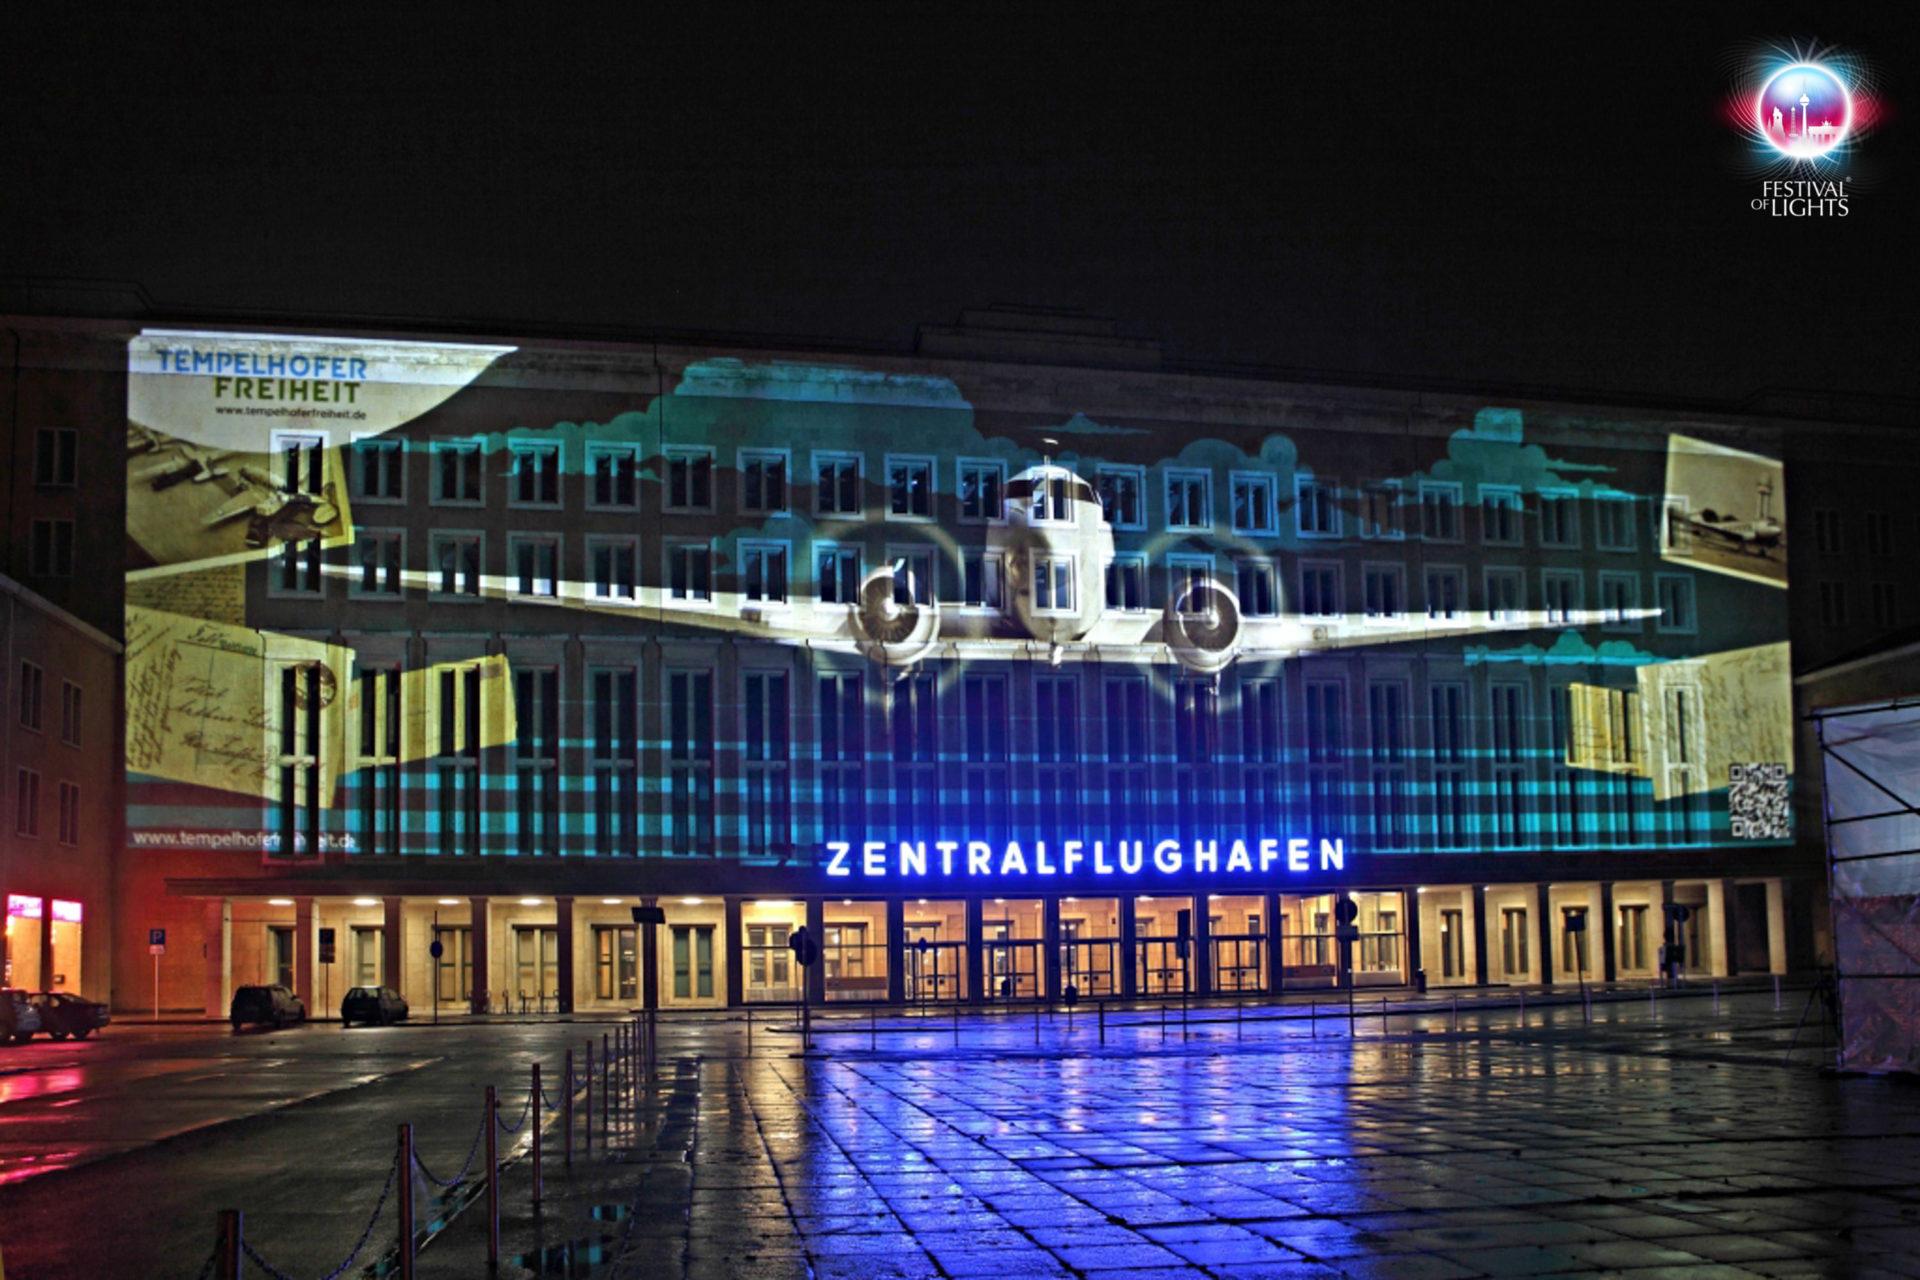 Flughafen Tempelhof - Tempelhofer Freiheit - 2012